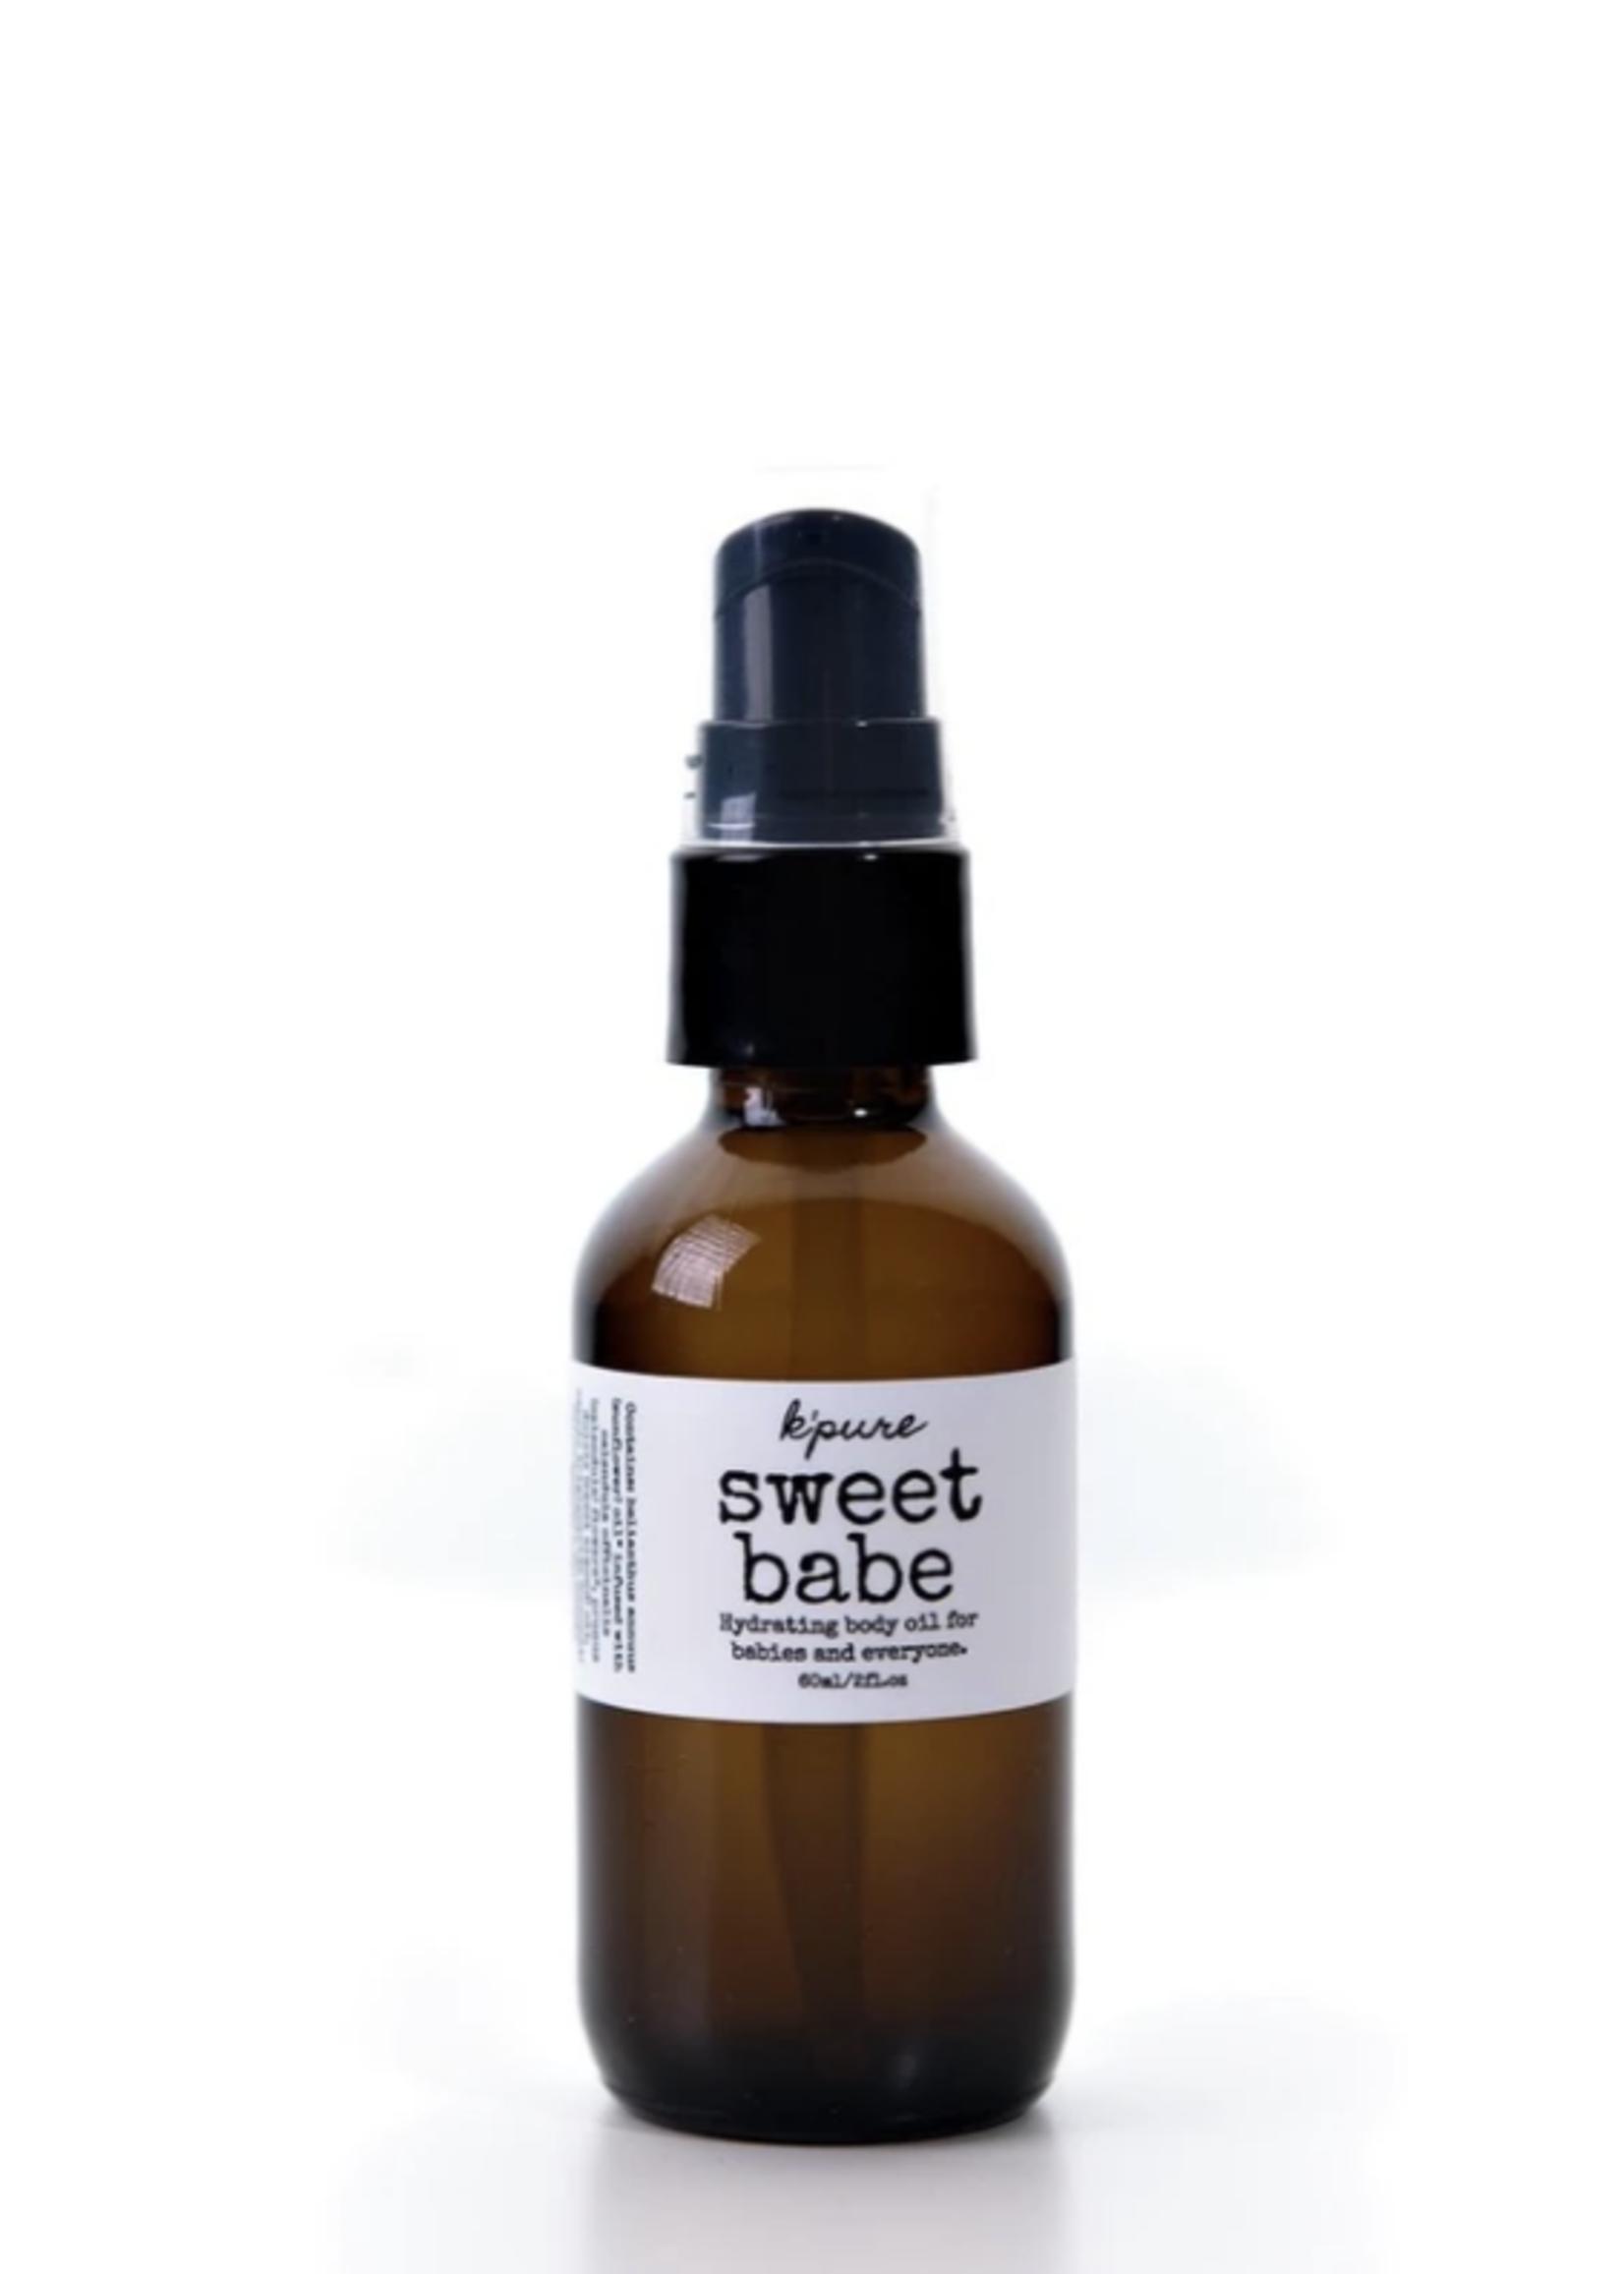 K'Pure Sweet Babe Body Oil